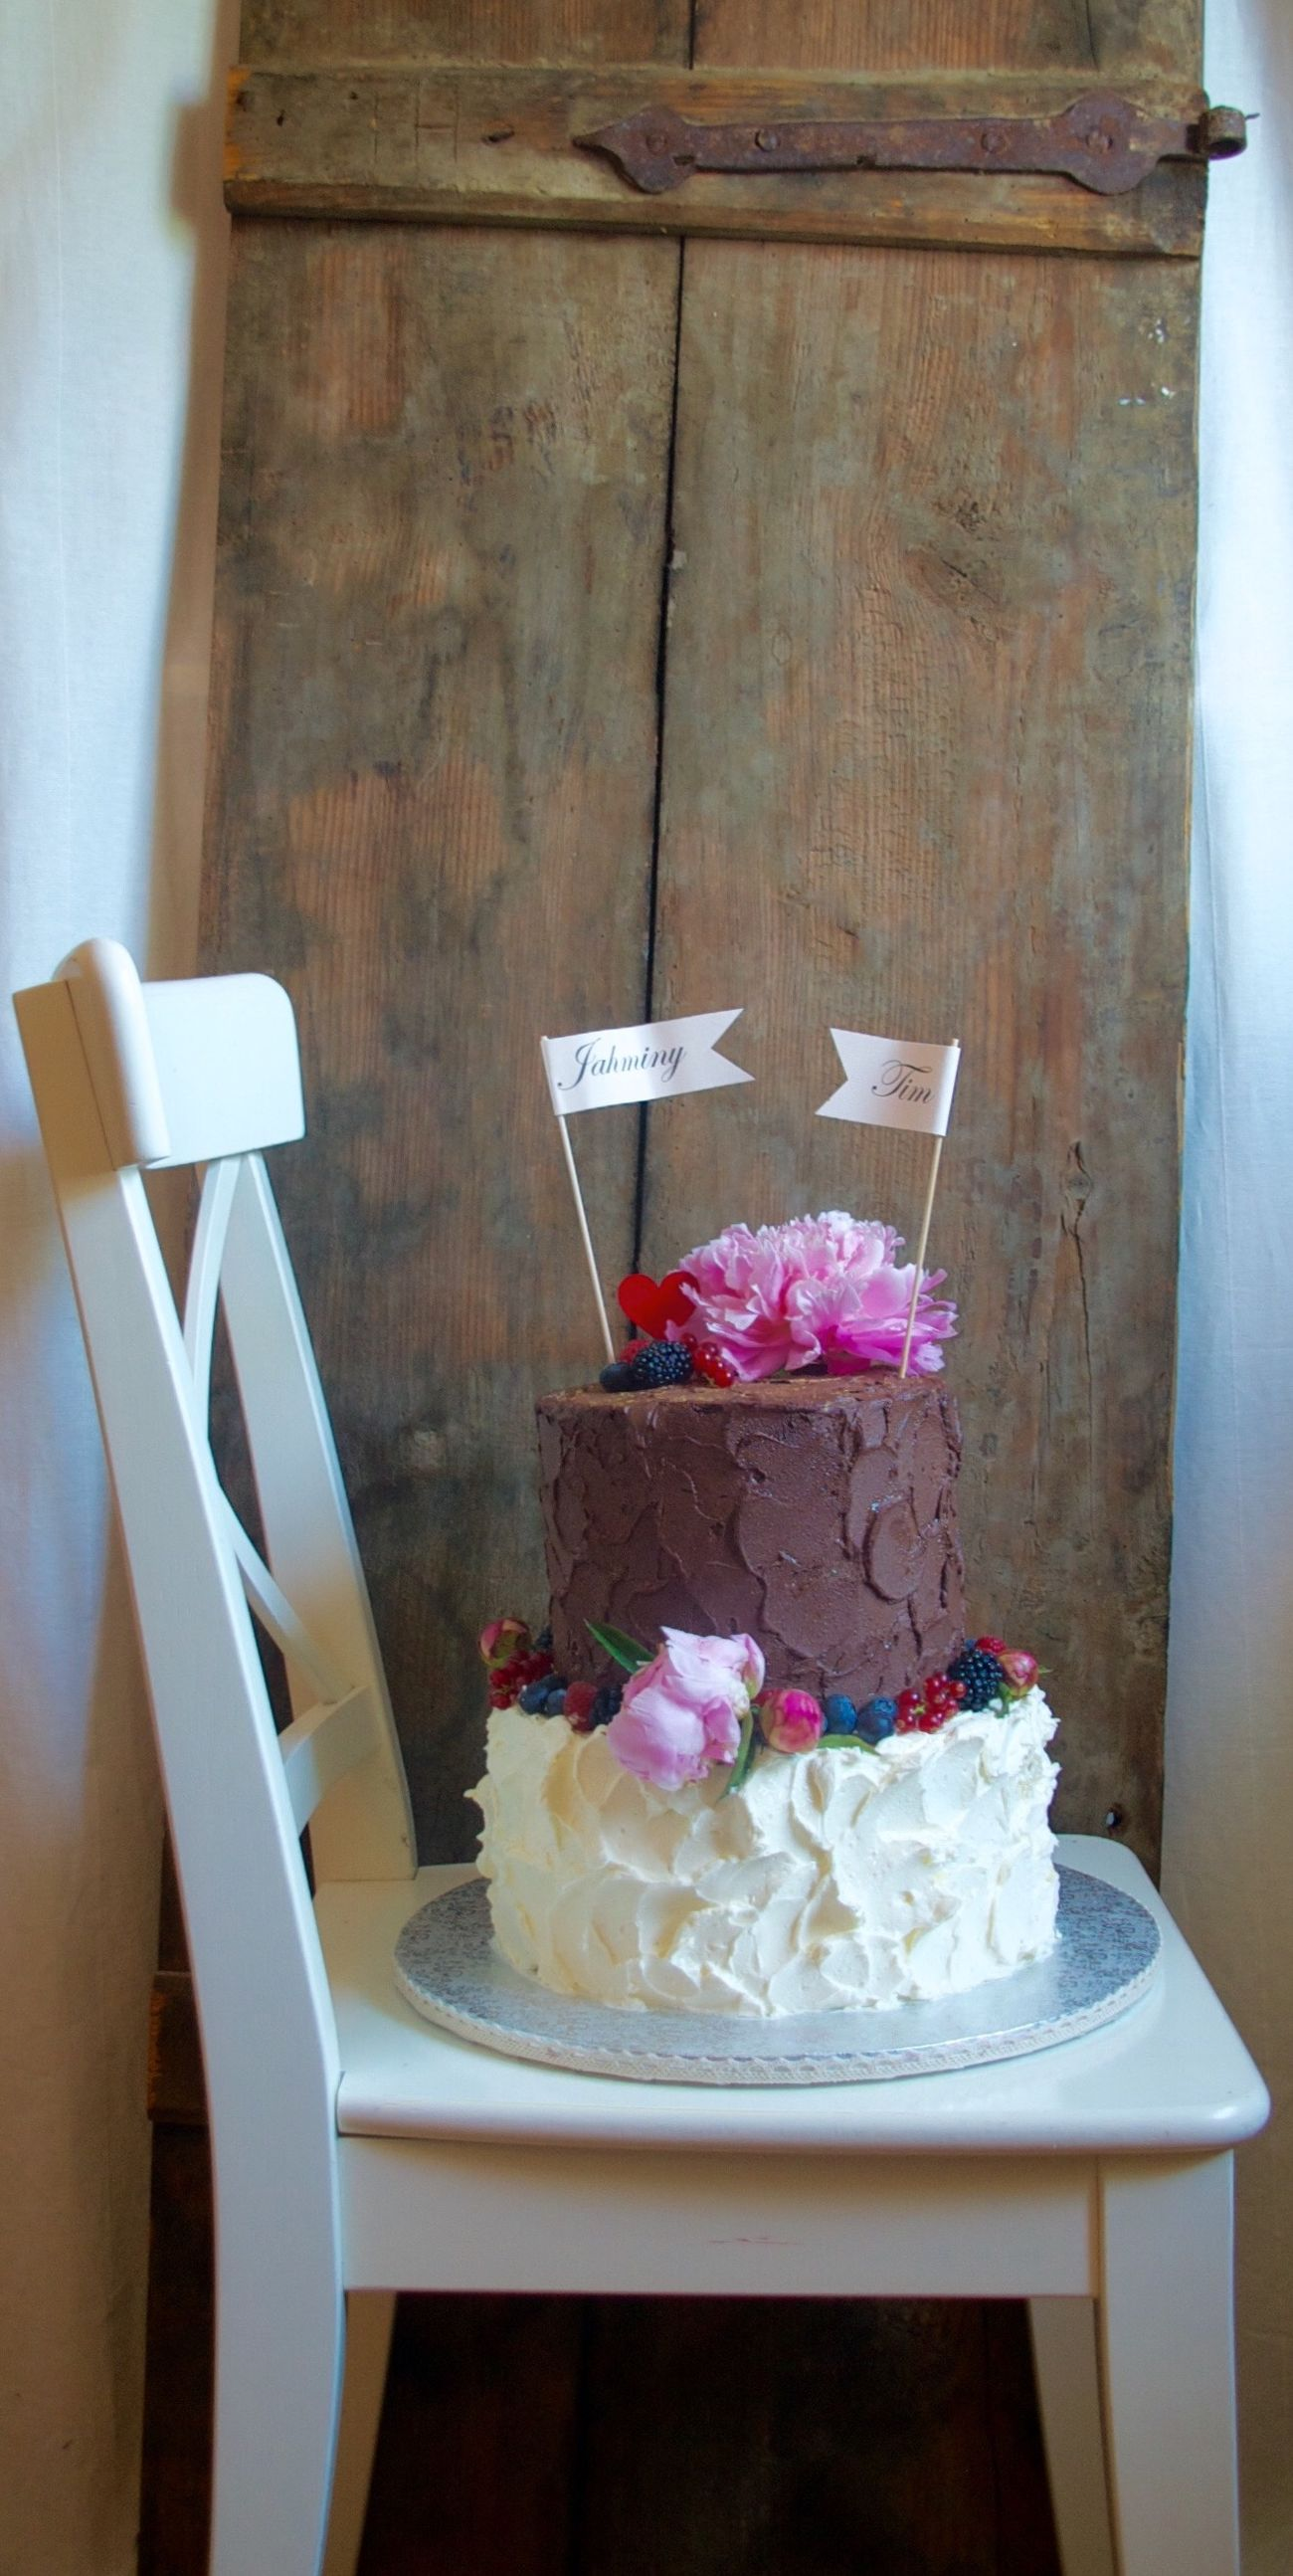 Mohrentopf-freiburg Foodporn Sweets Weddingcake Lovely MohrenTopf ILoveMyJob